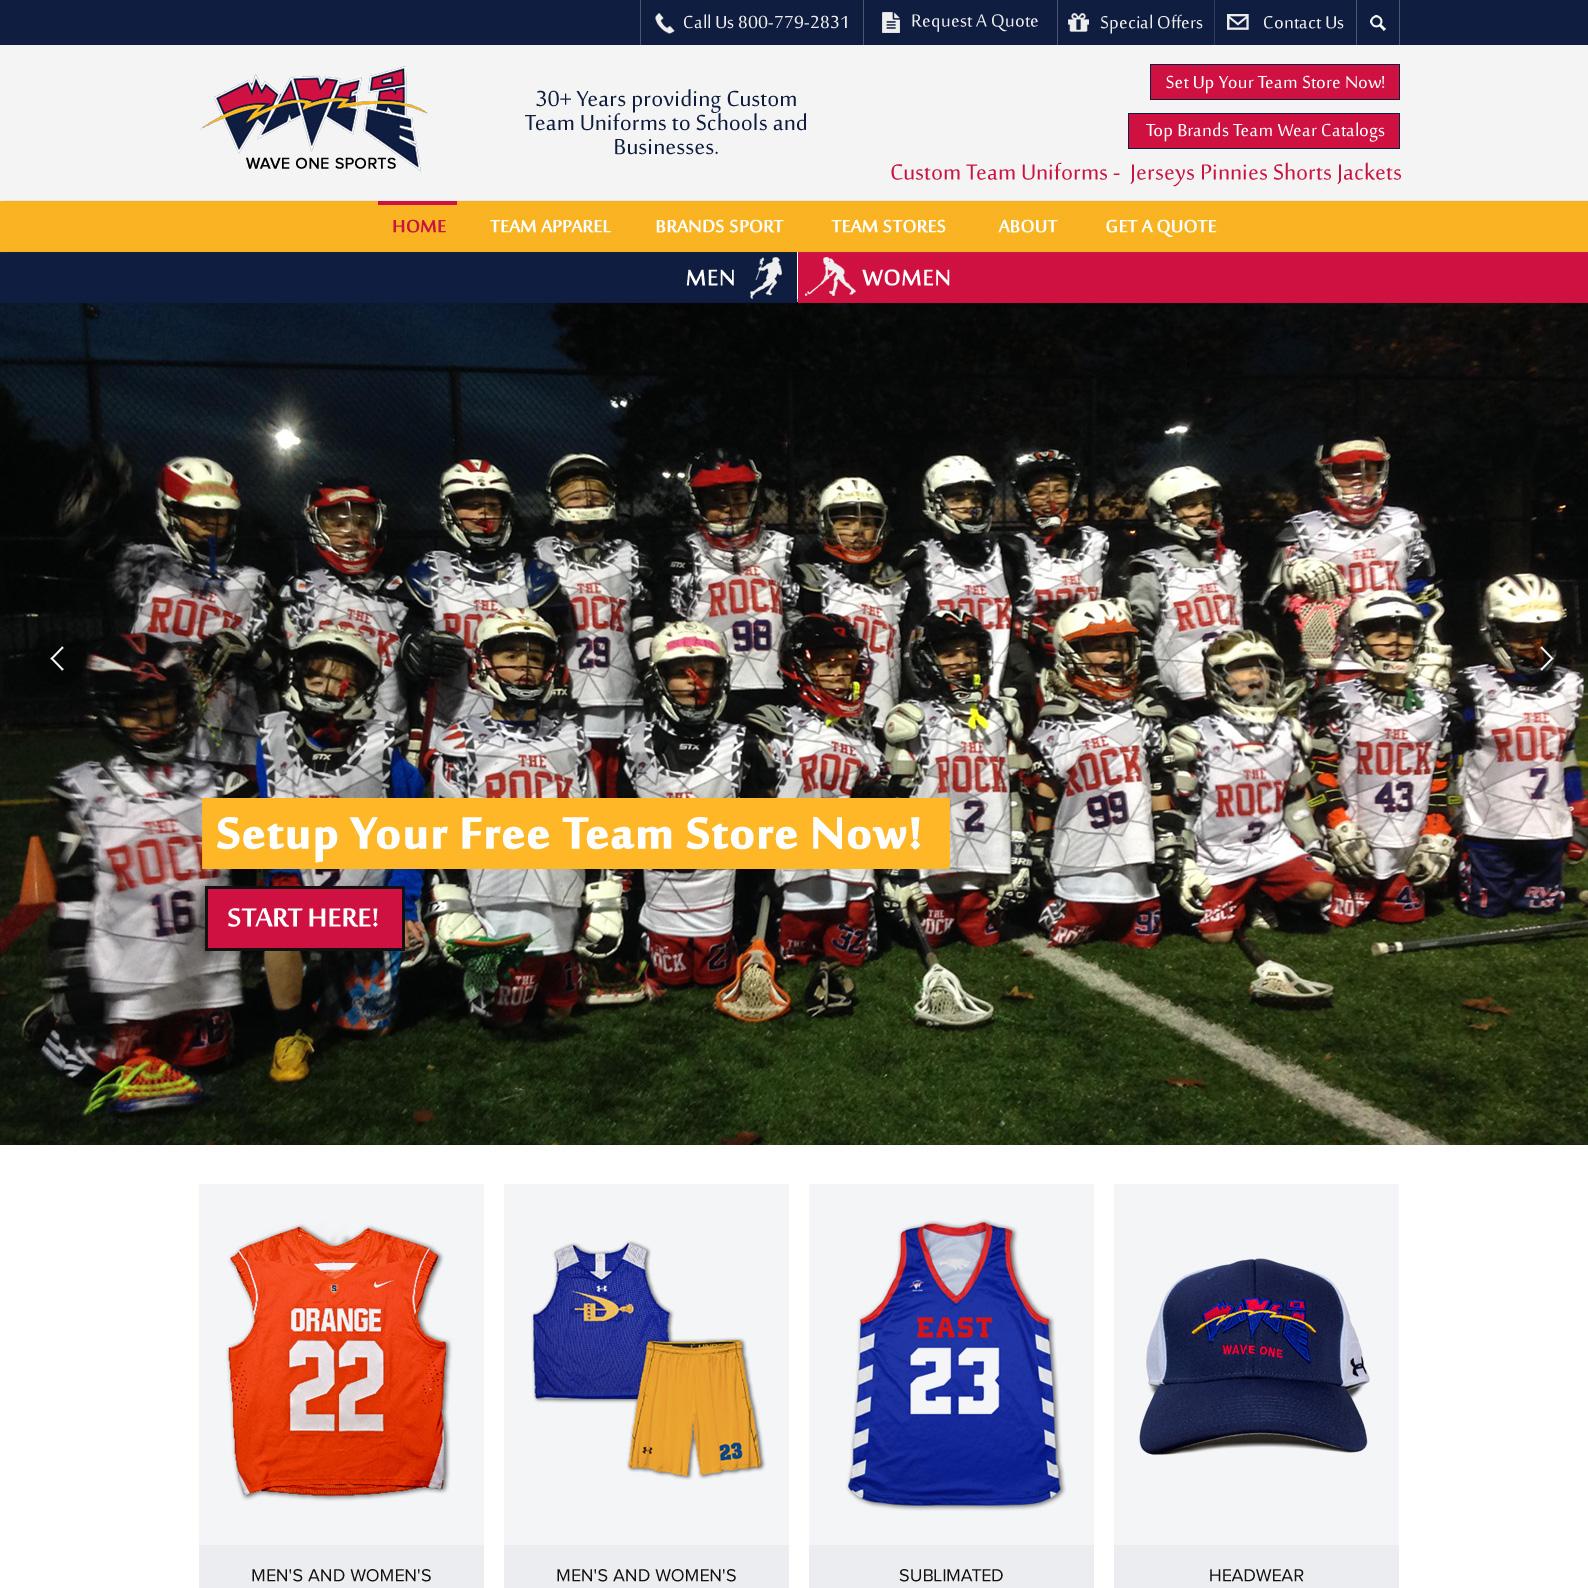 Wave One Sports custom sports team uniform website design